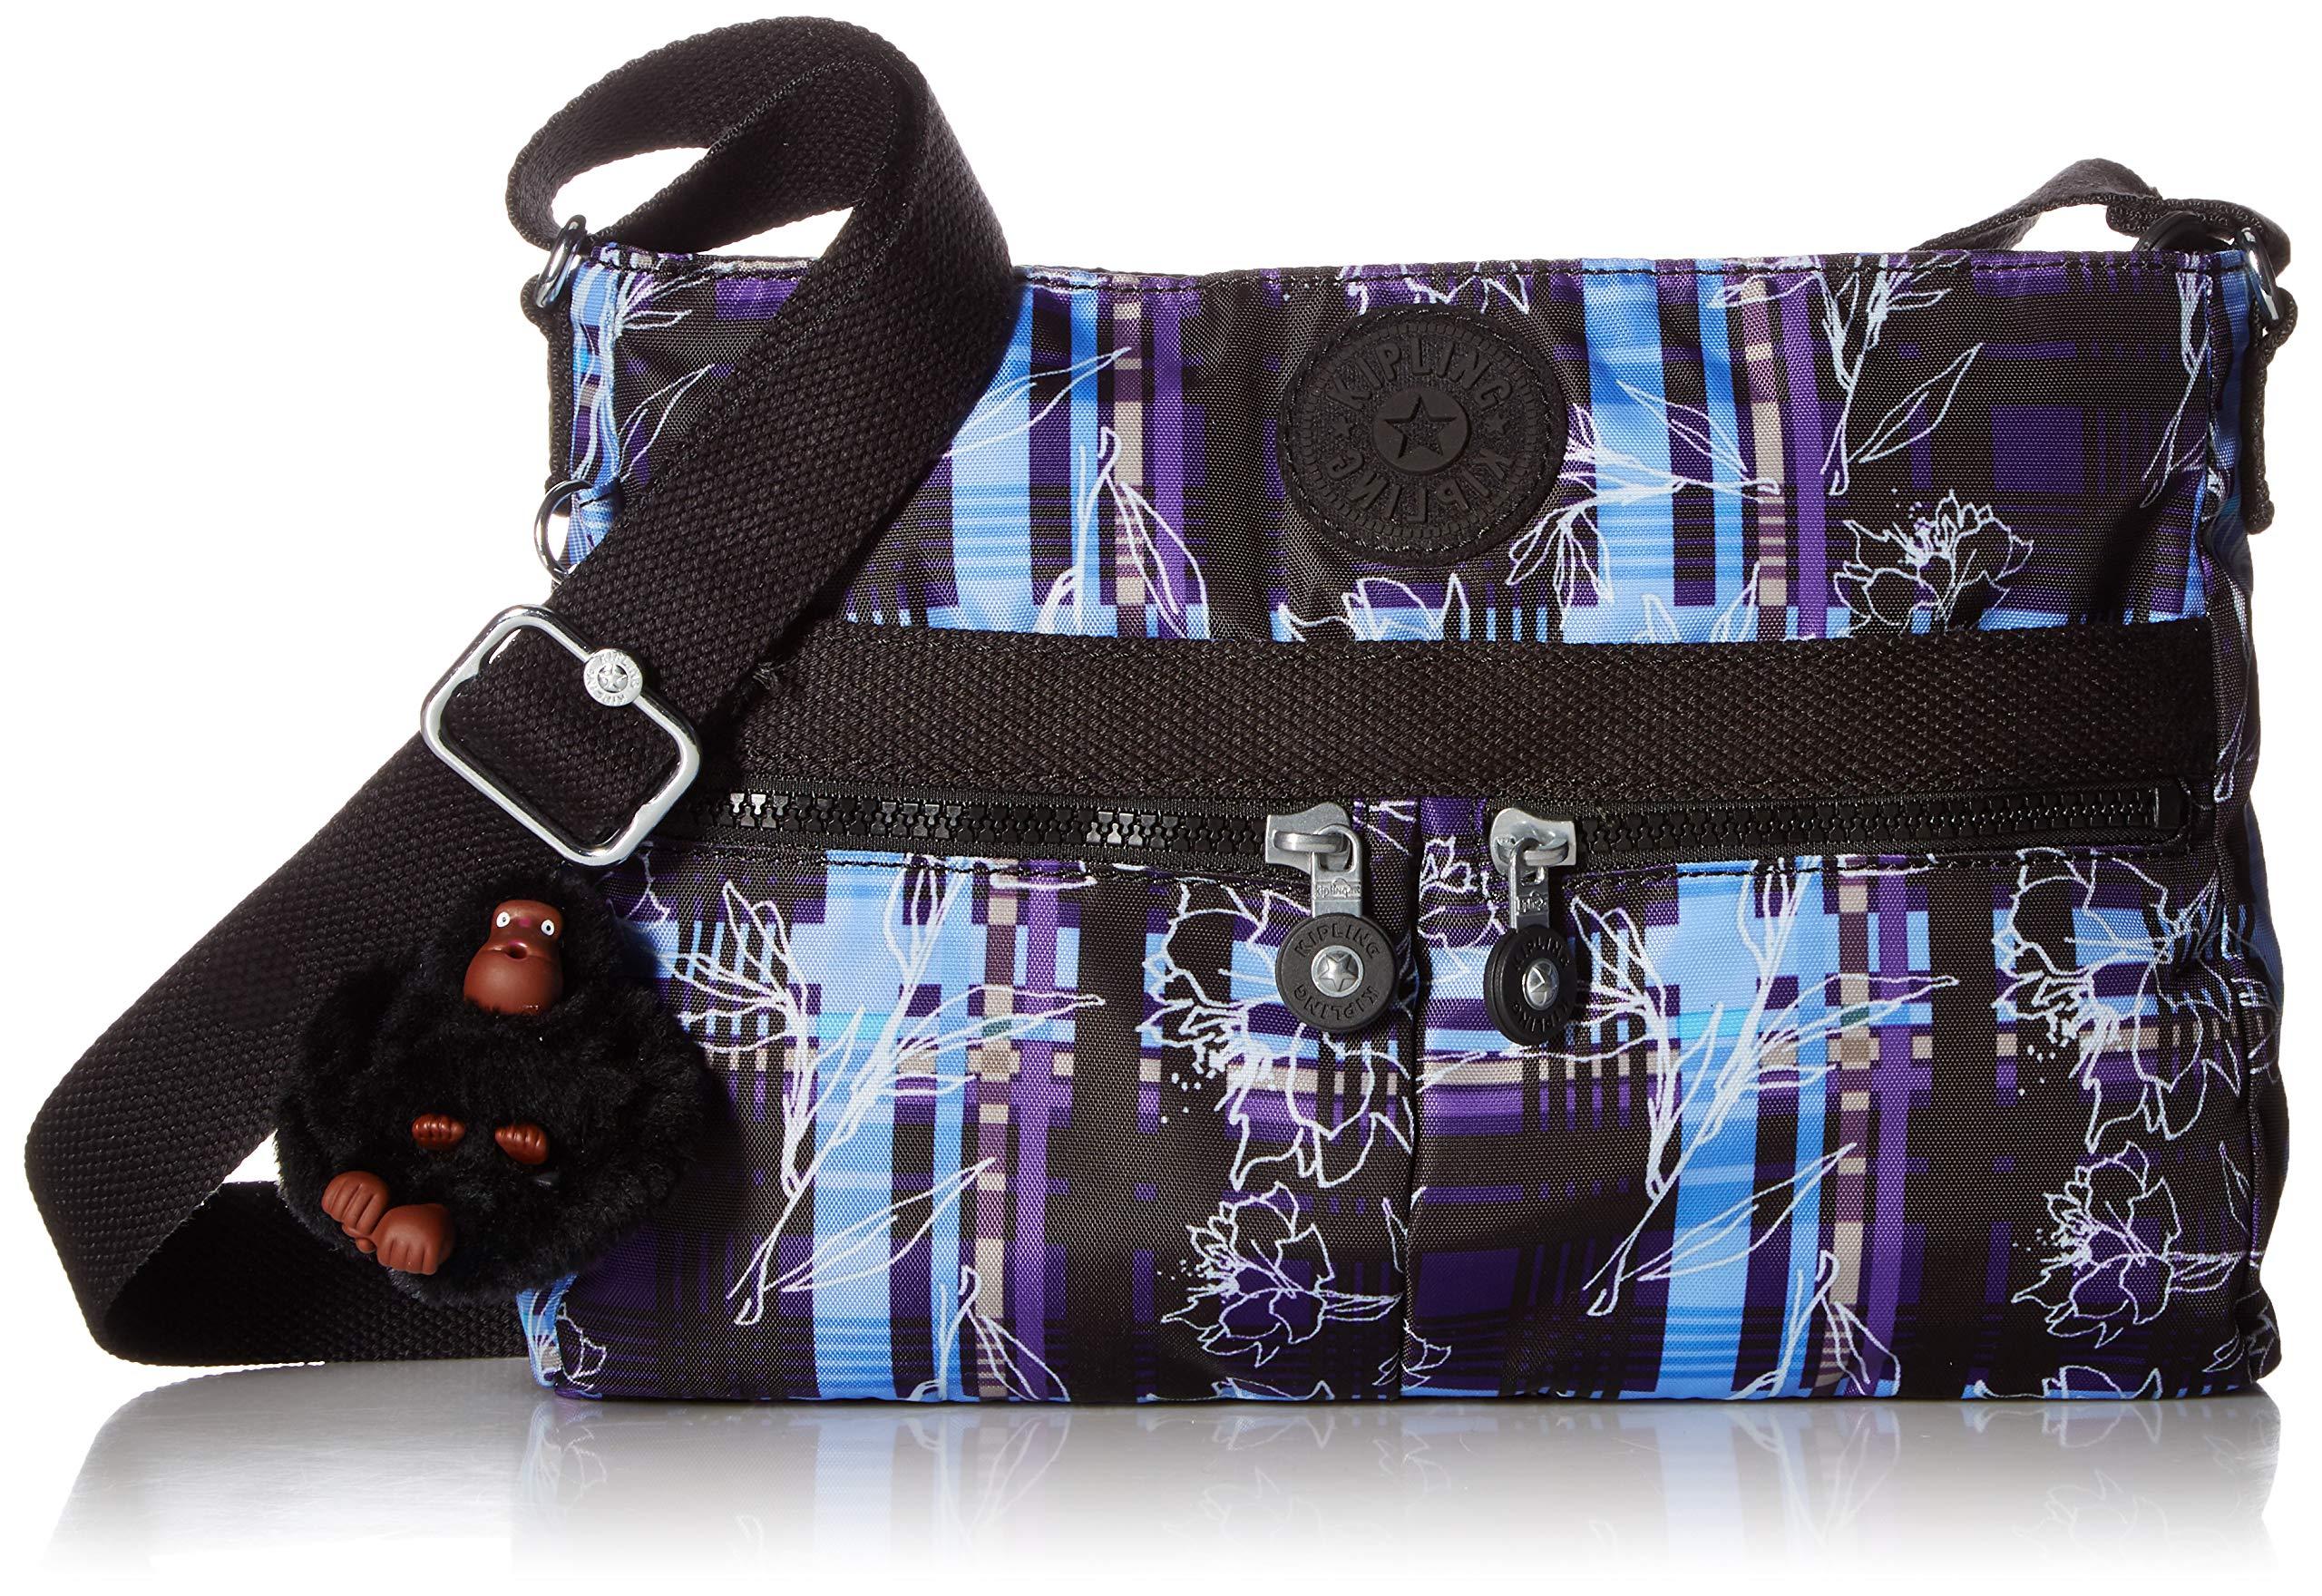 Kipling Women's Angie Crossbody Bag, Darling dashes